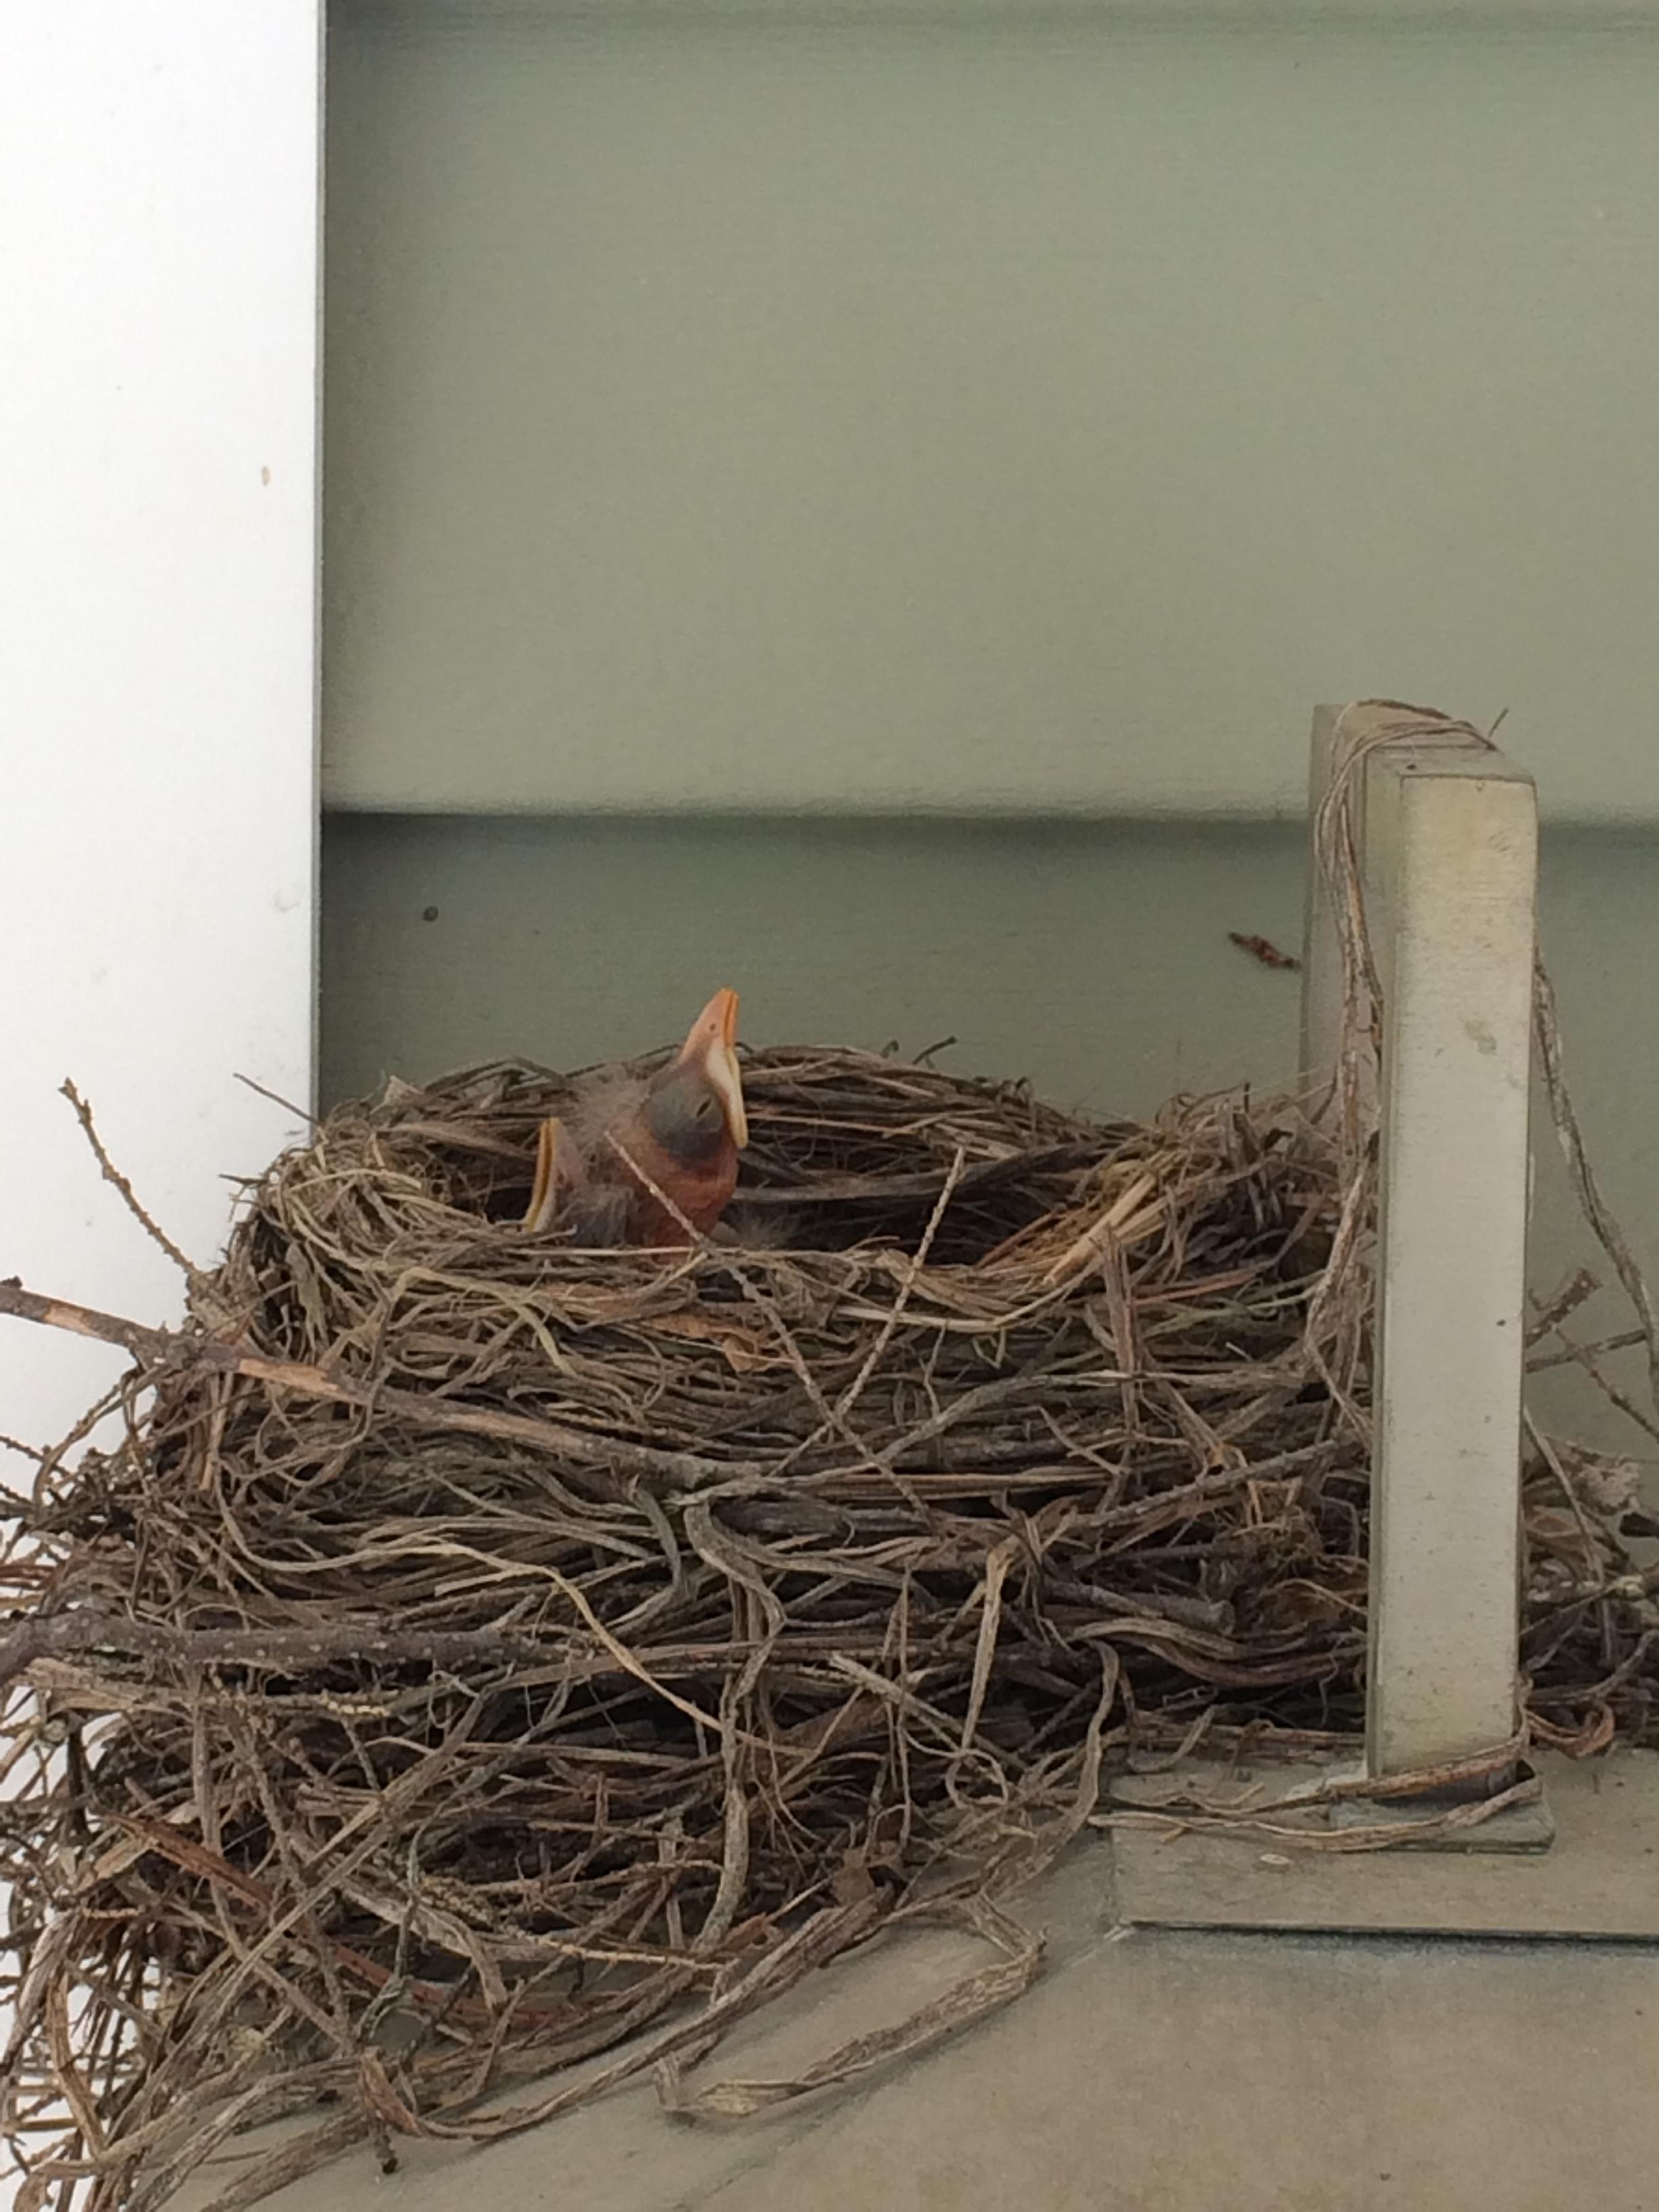 Seemingly always hungry nestlings!